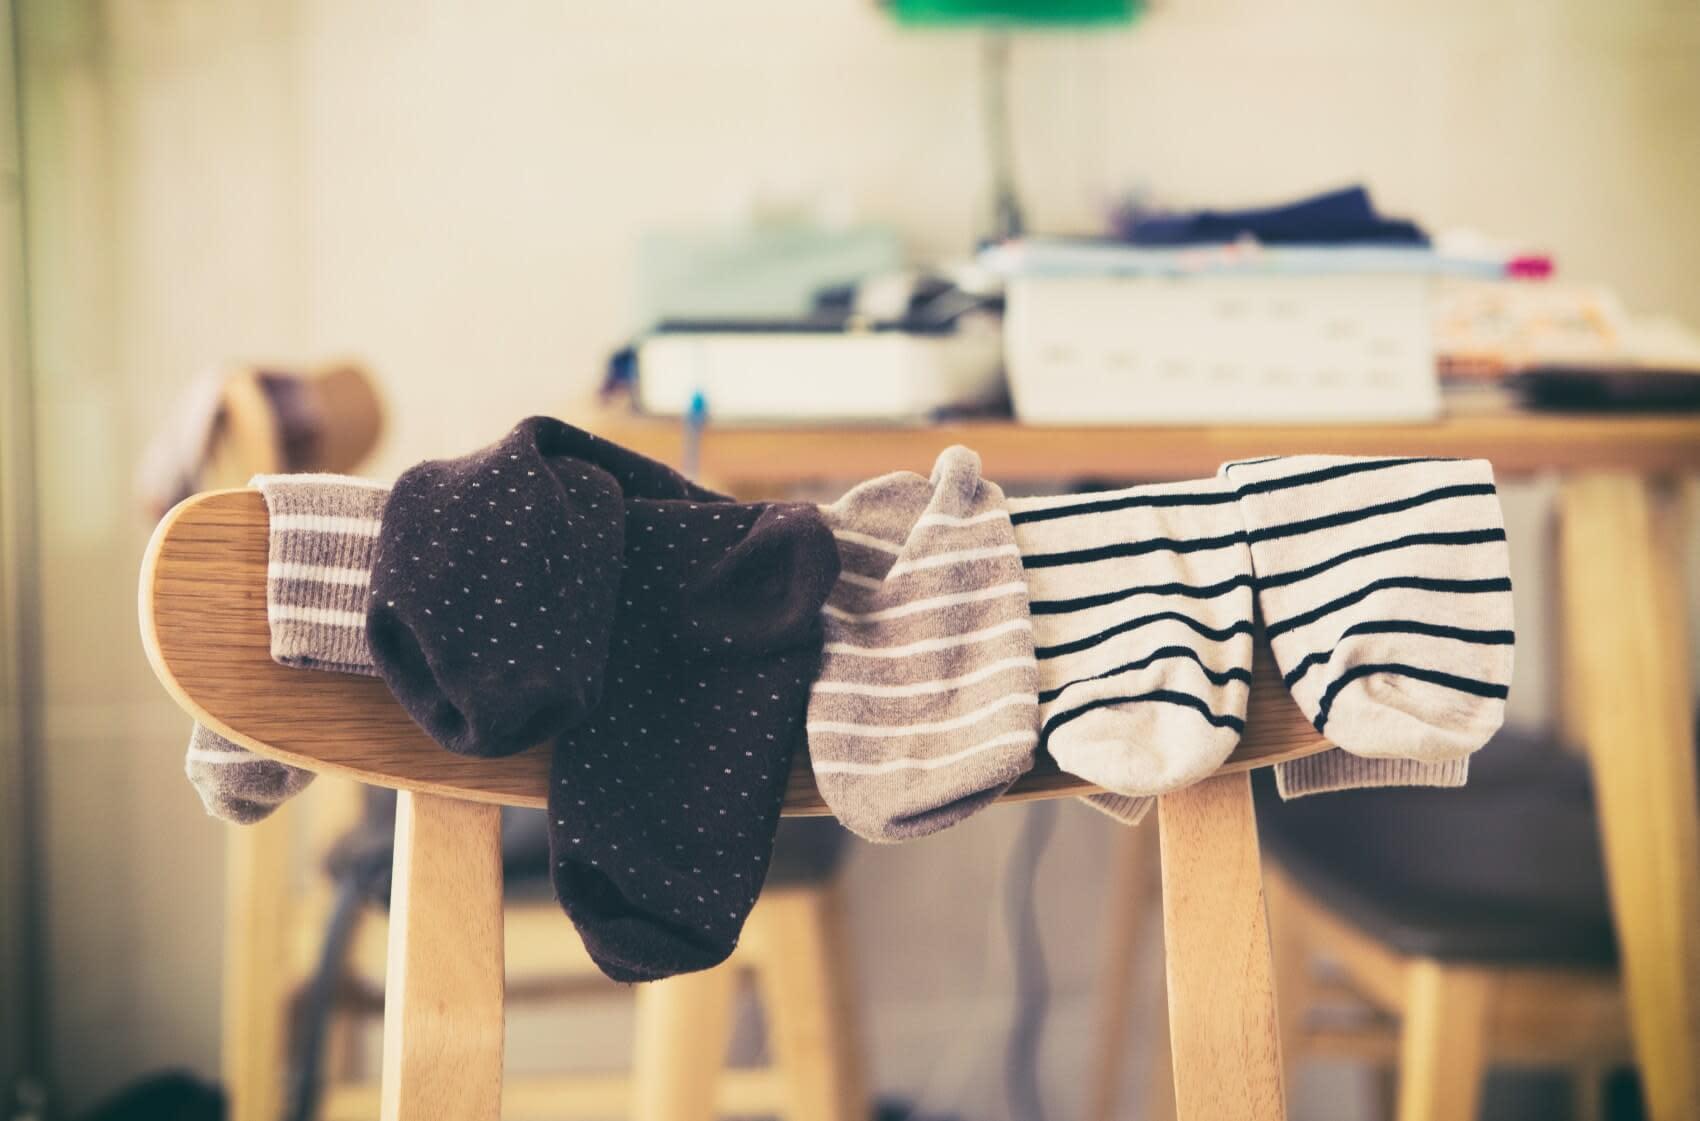 Socks on a chair drying